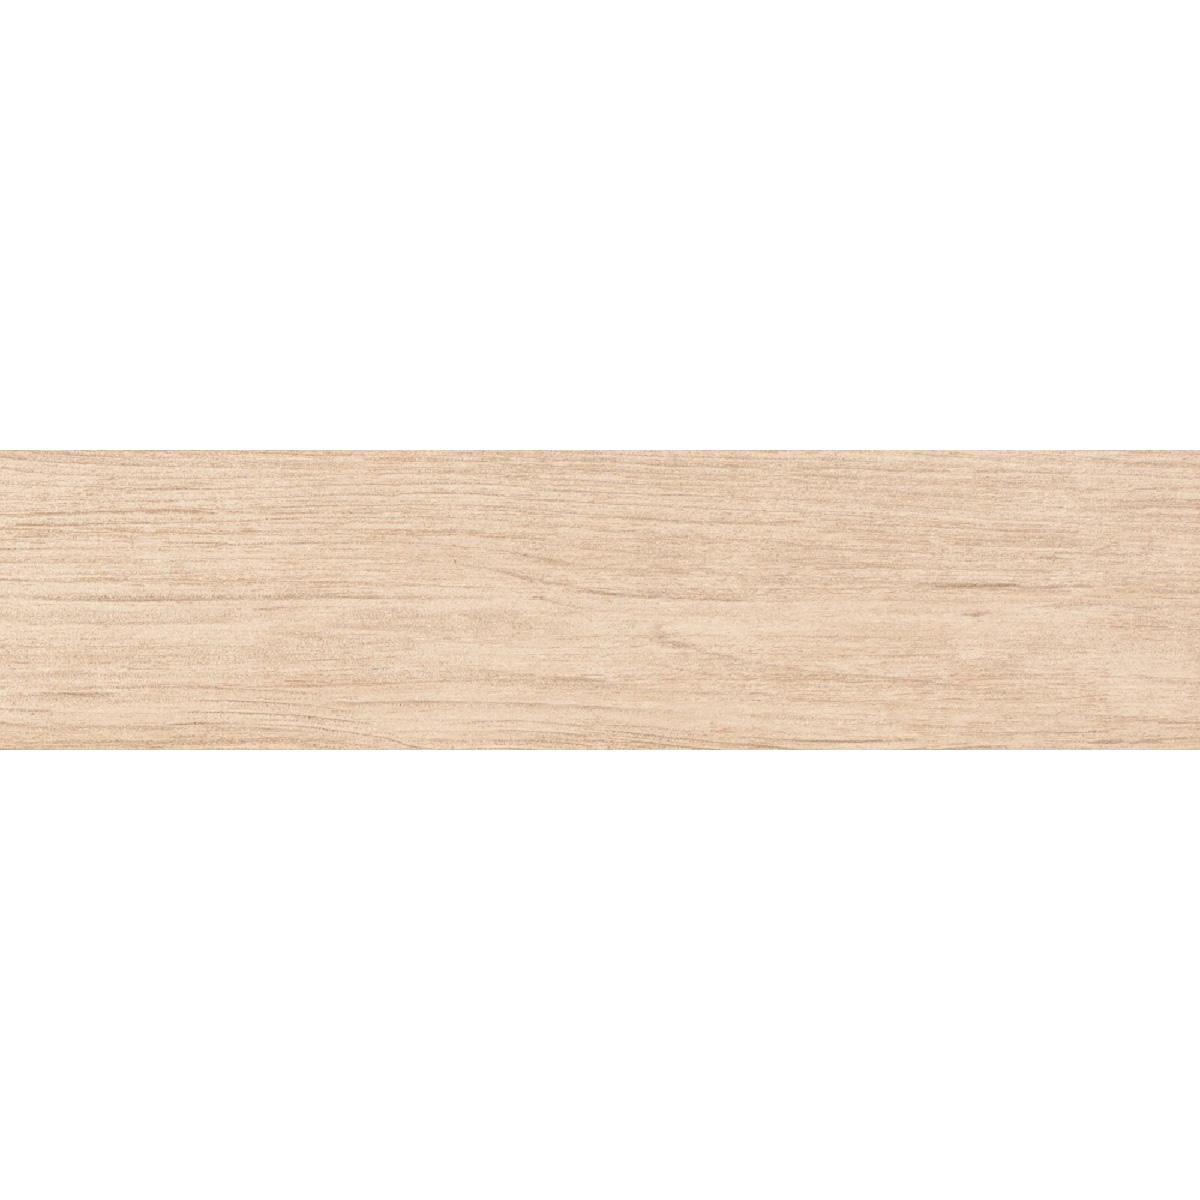 Bamboo (zsxptr3r) изображение 0